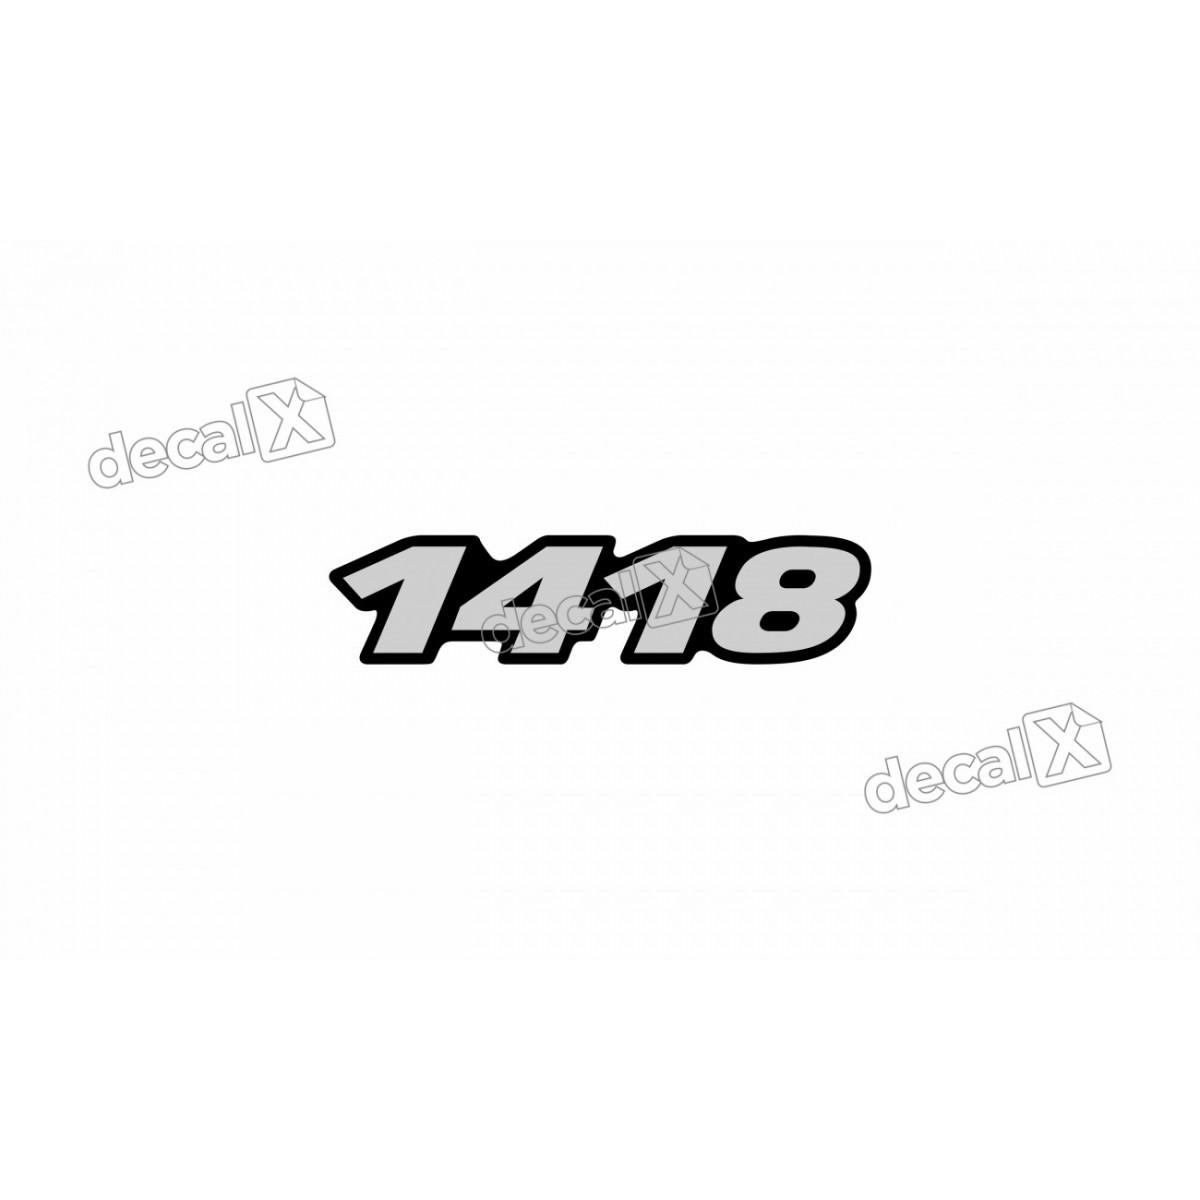 Adesivo Emblema Resinado Mercedes 1418 Cm30 Decalx